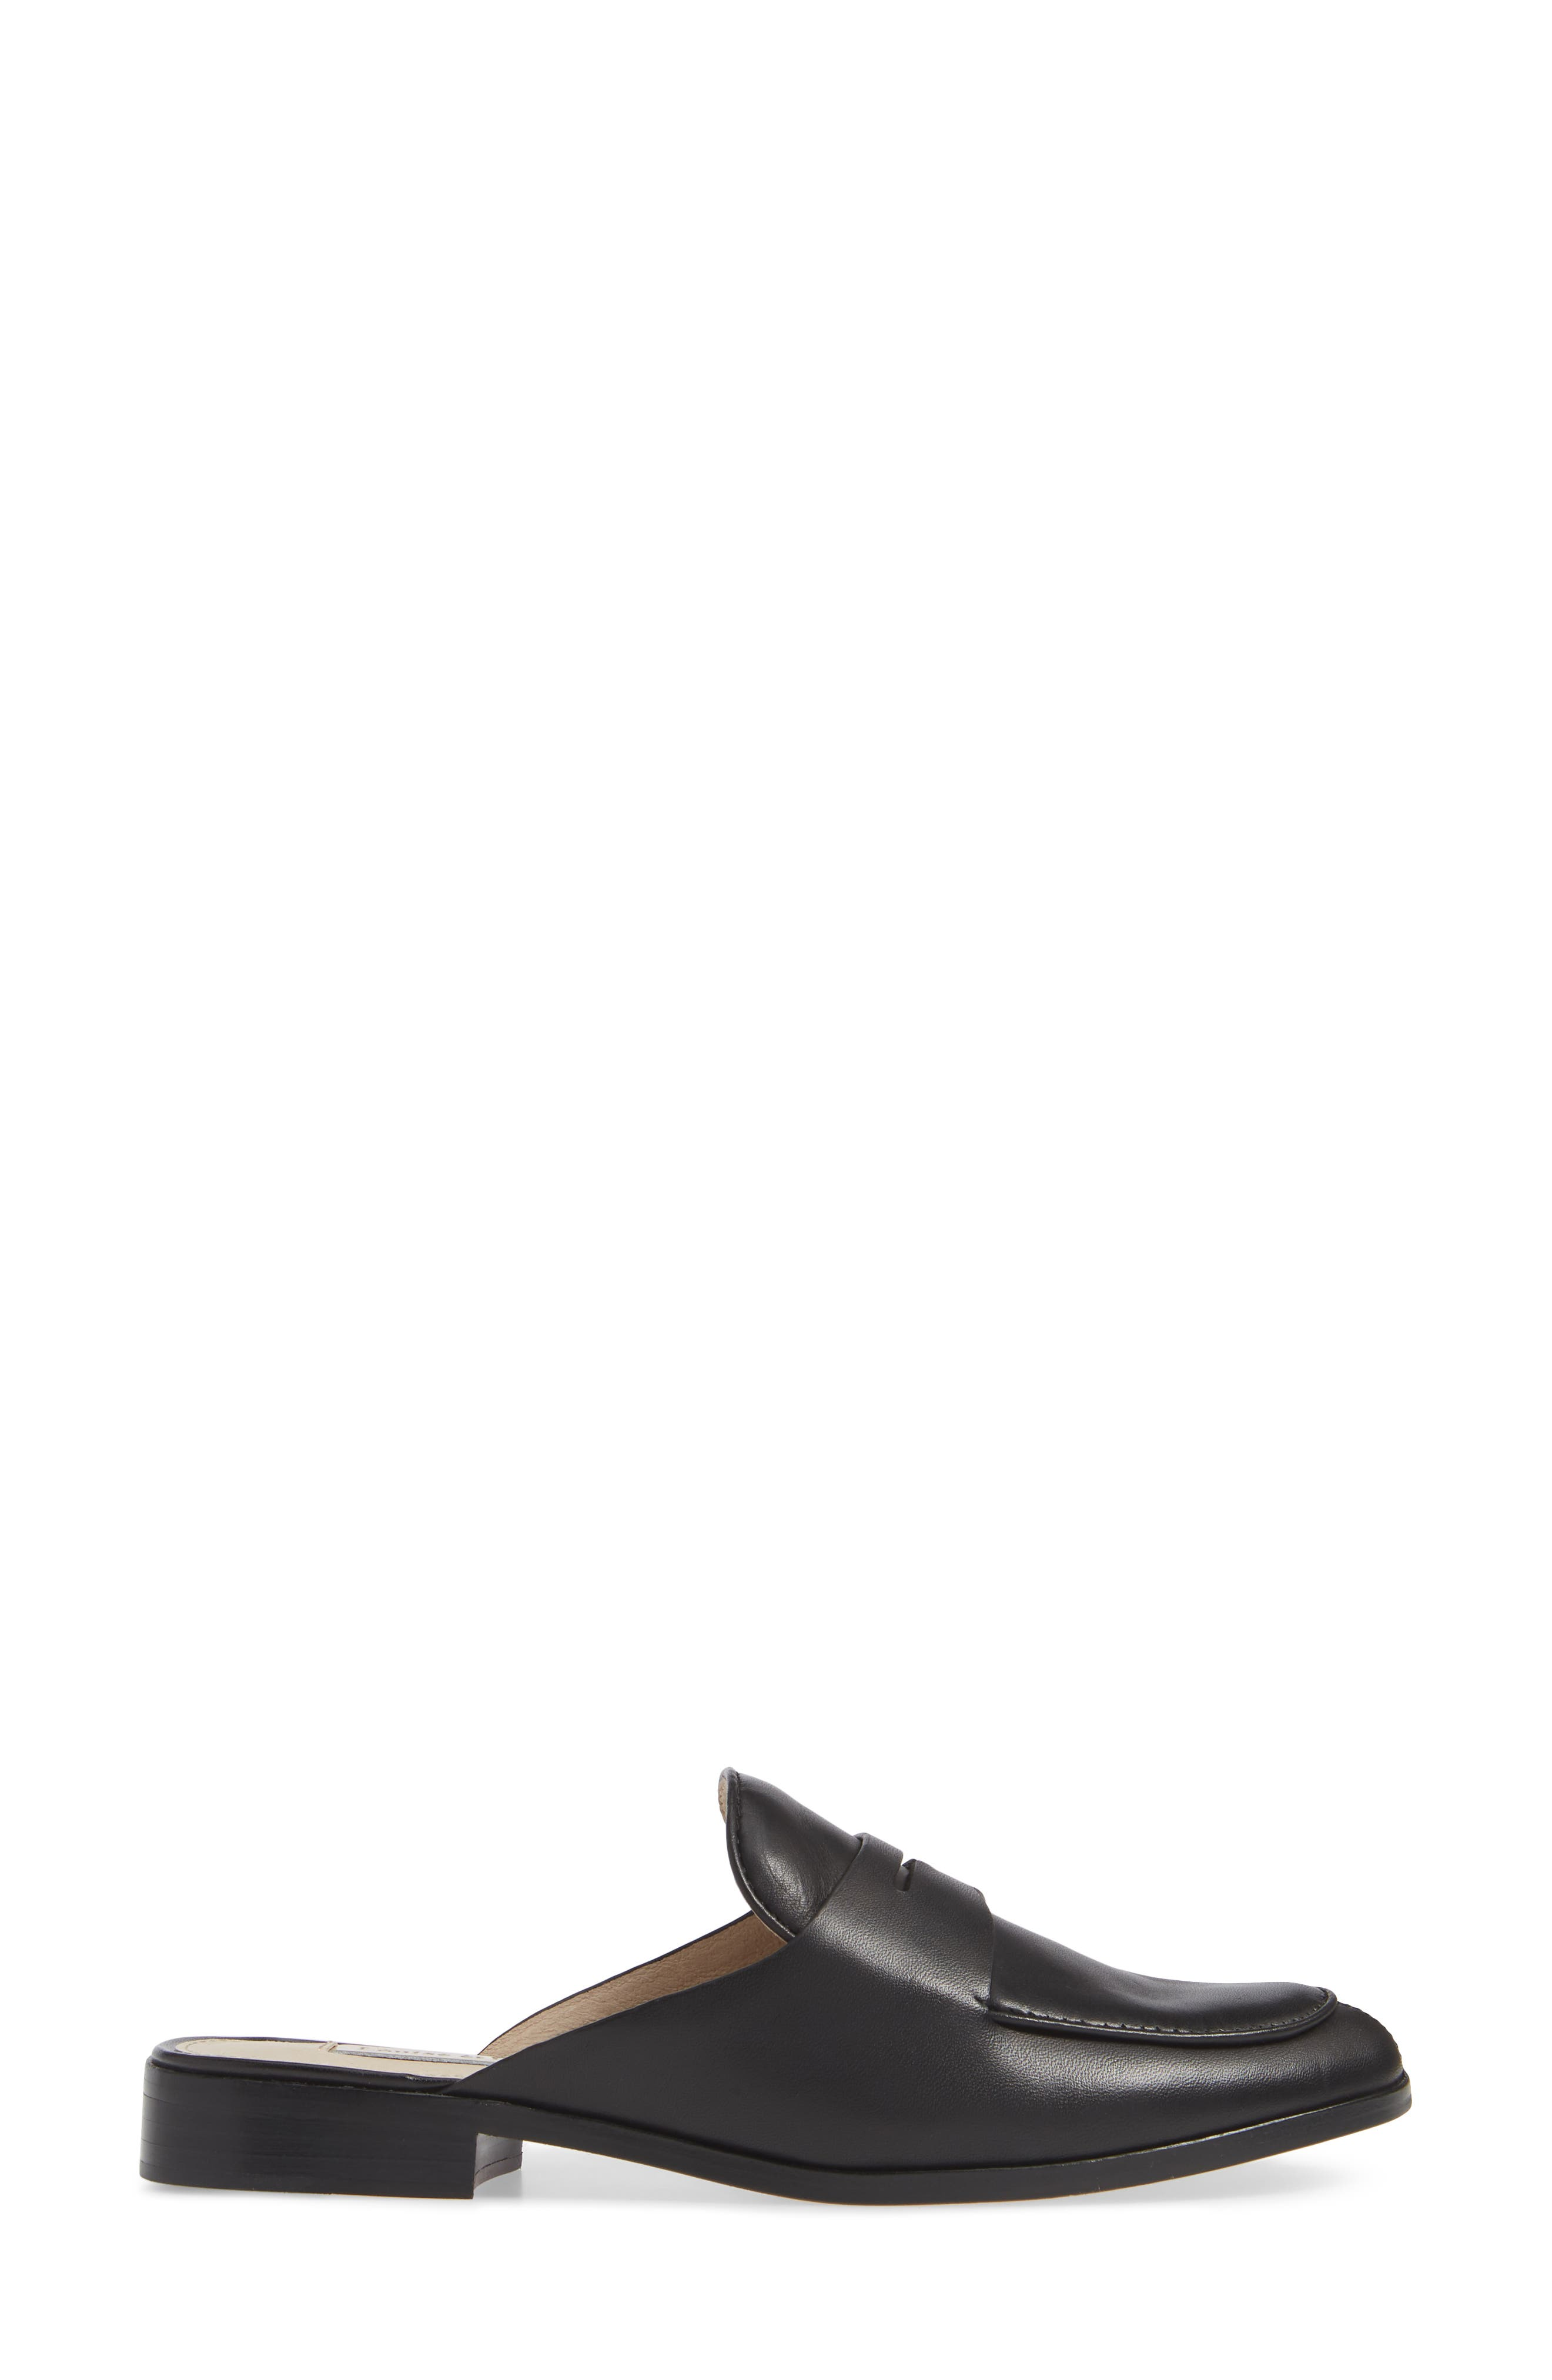 LOUISE ET CIE, Dugan Flat Loafer Mule, Alternate thumbnail 3, color, BLACK/BLACK LEATHER